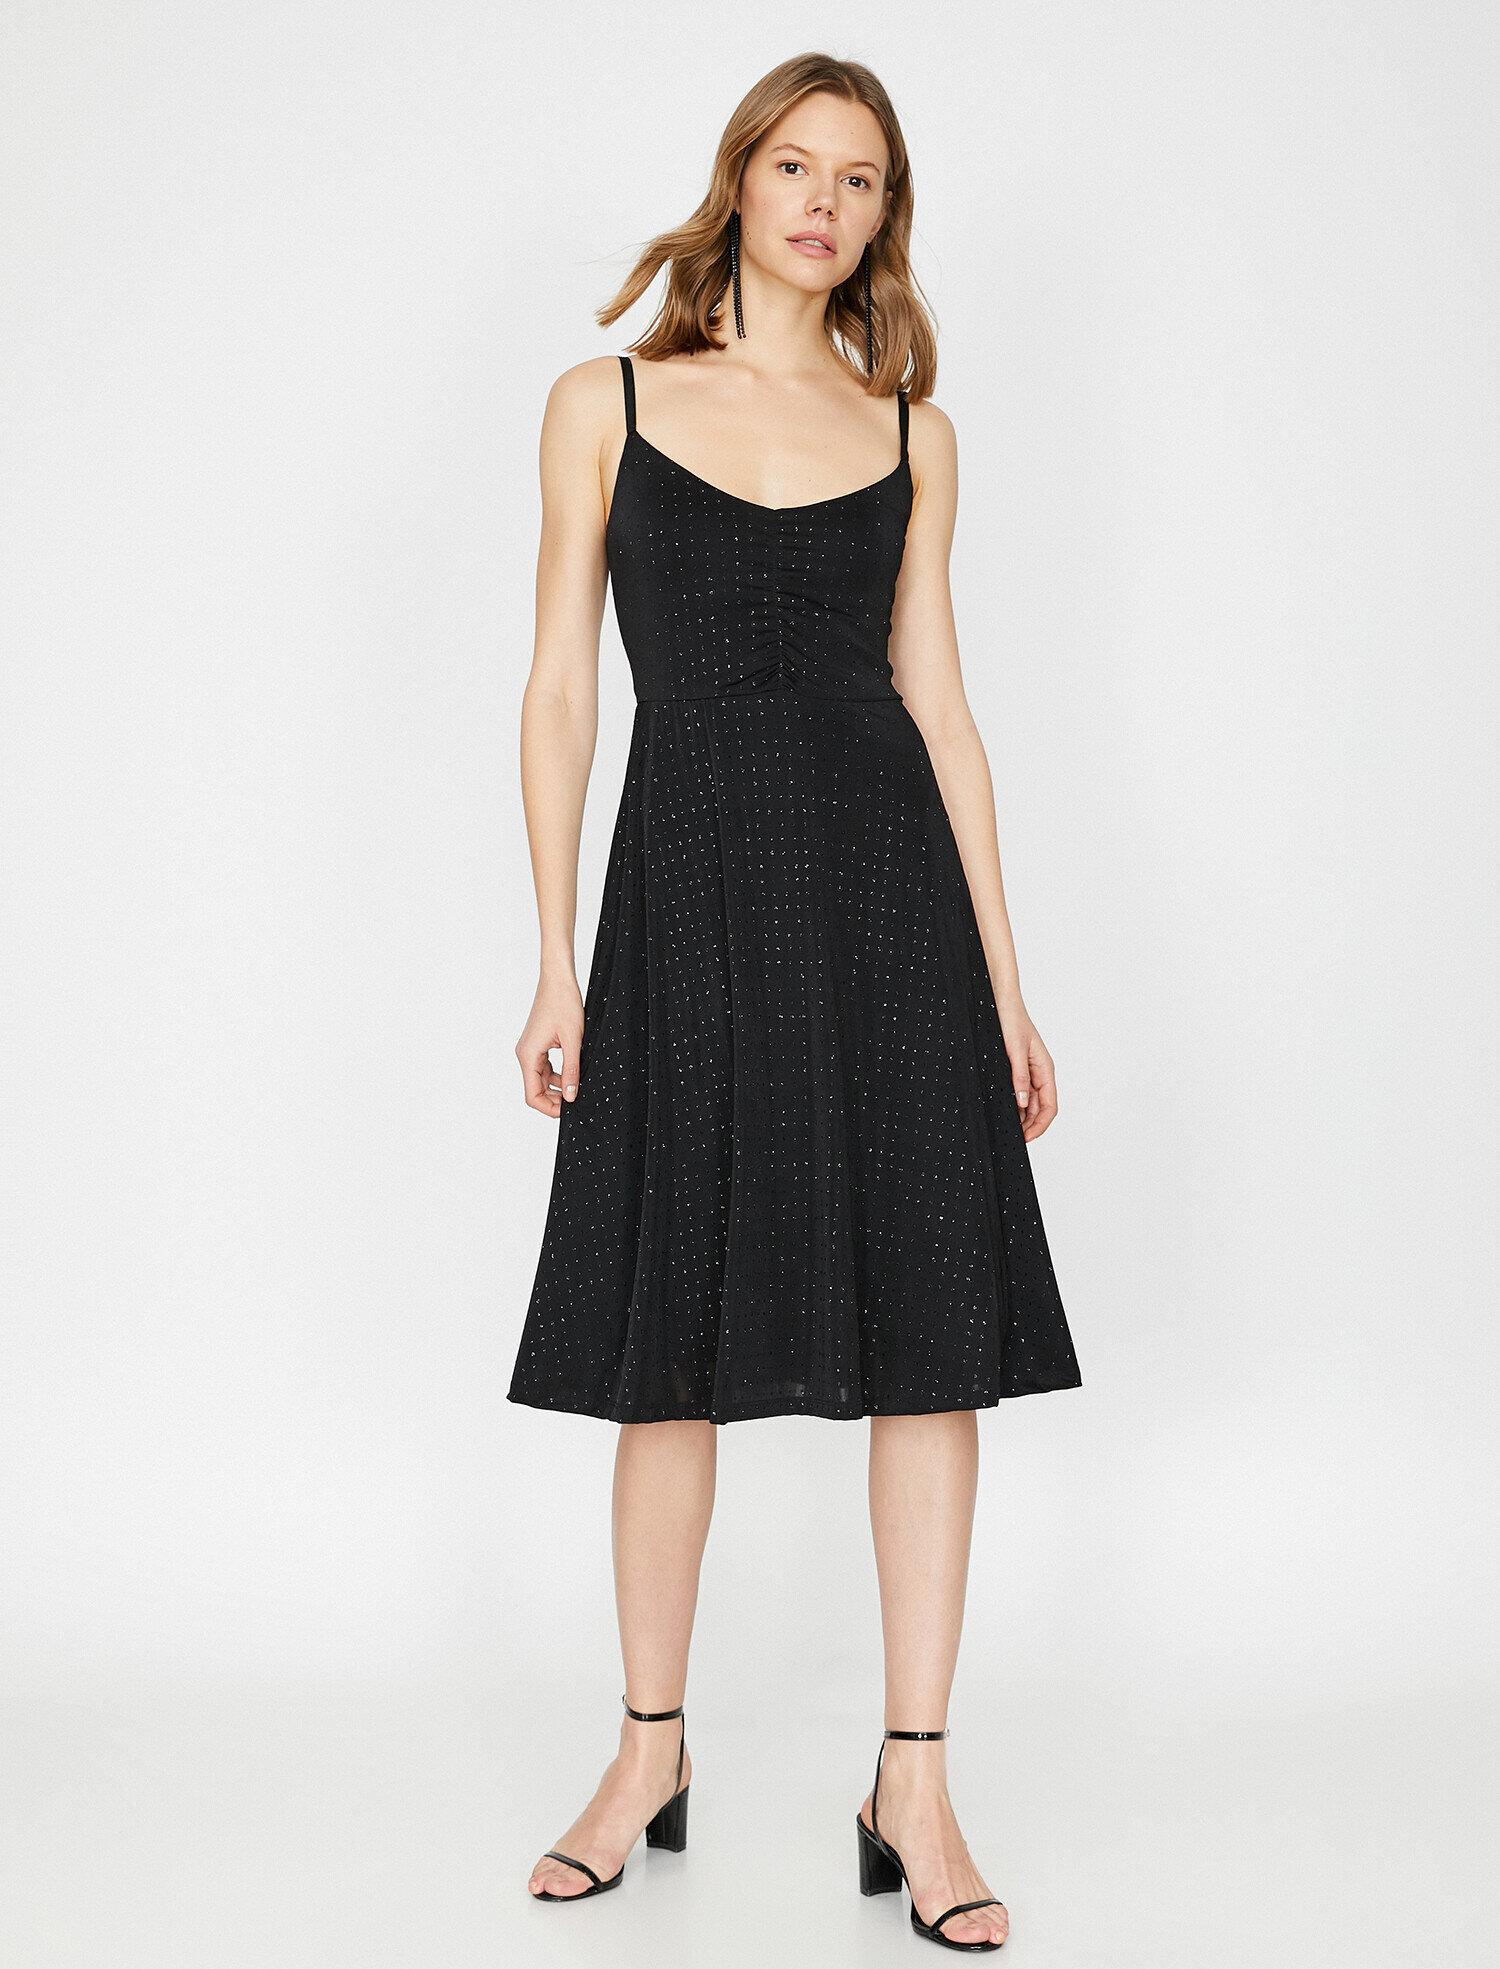 c9f52fa50bfa3 Siyah Bayan Desenli Elbise 9YAK84973FK999   Koton